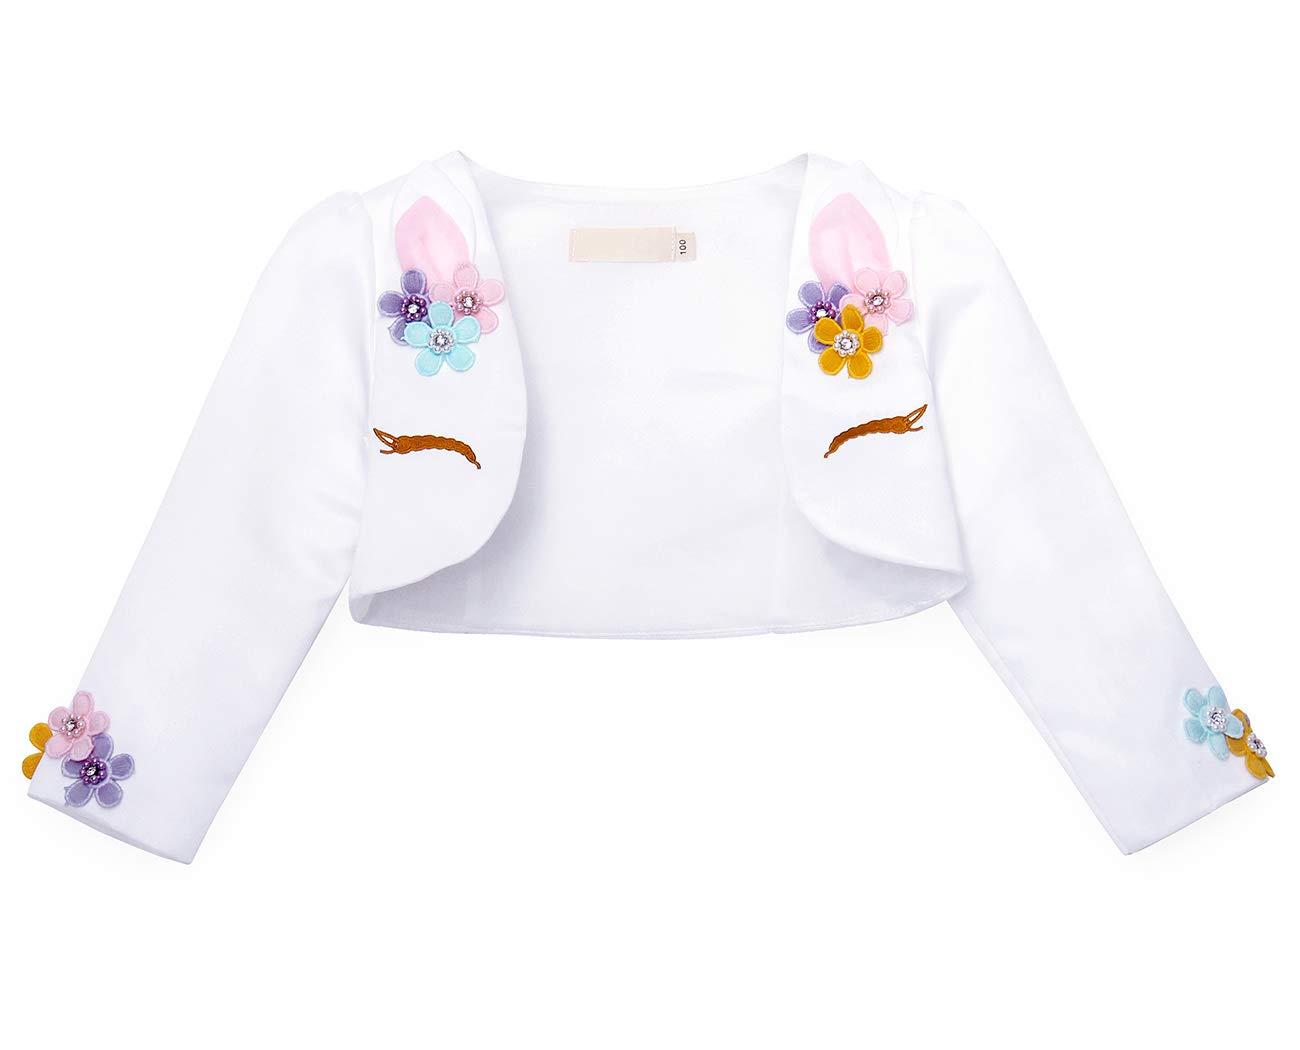 AmzBarley Toddler Girls Unicorn Princess Tutu Dress Up Halloween Costume Outfits Kids Cosplay Birthday Party Wedding